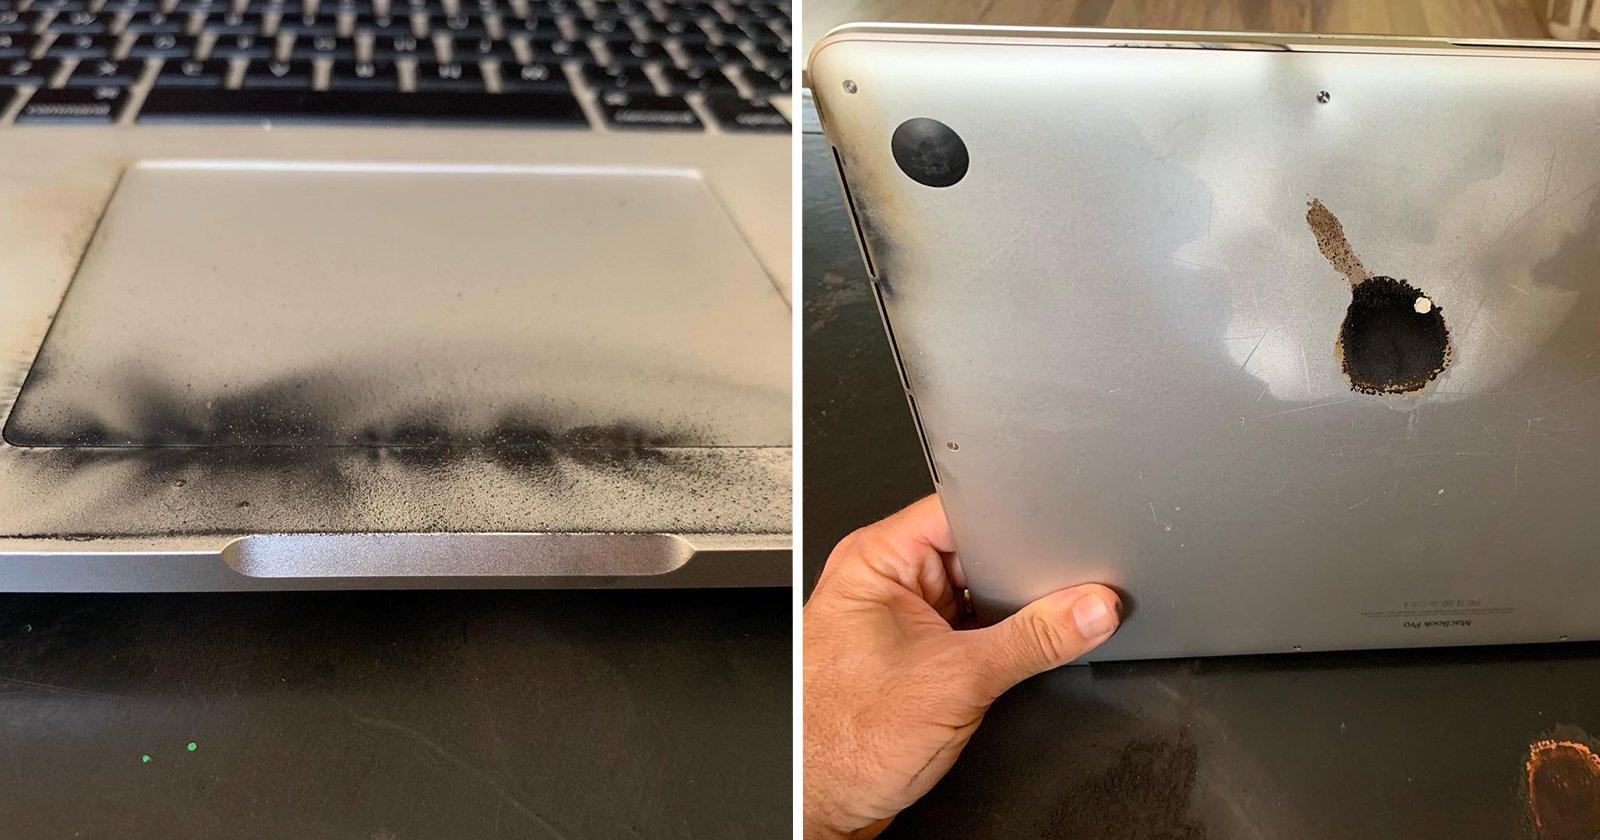 Apple's MacBook Pro Battery Recall is No Joke, Here's What